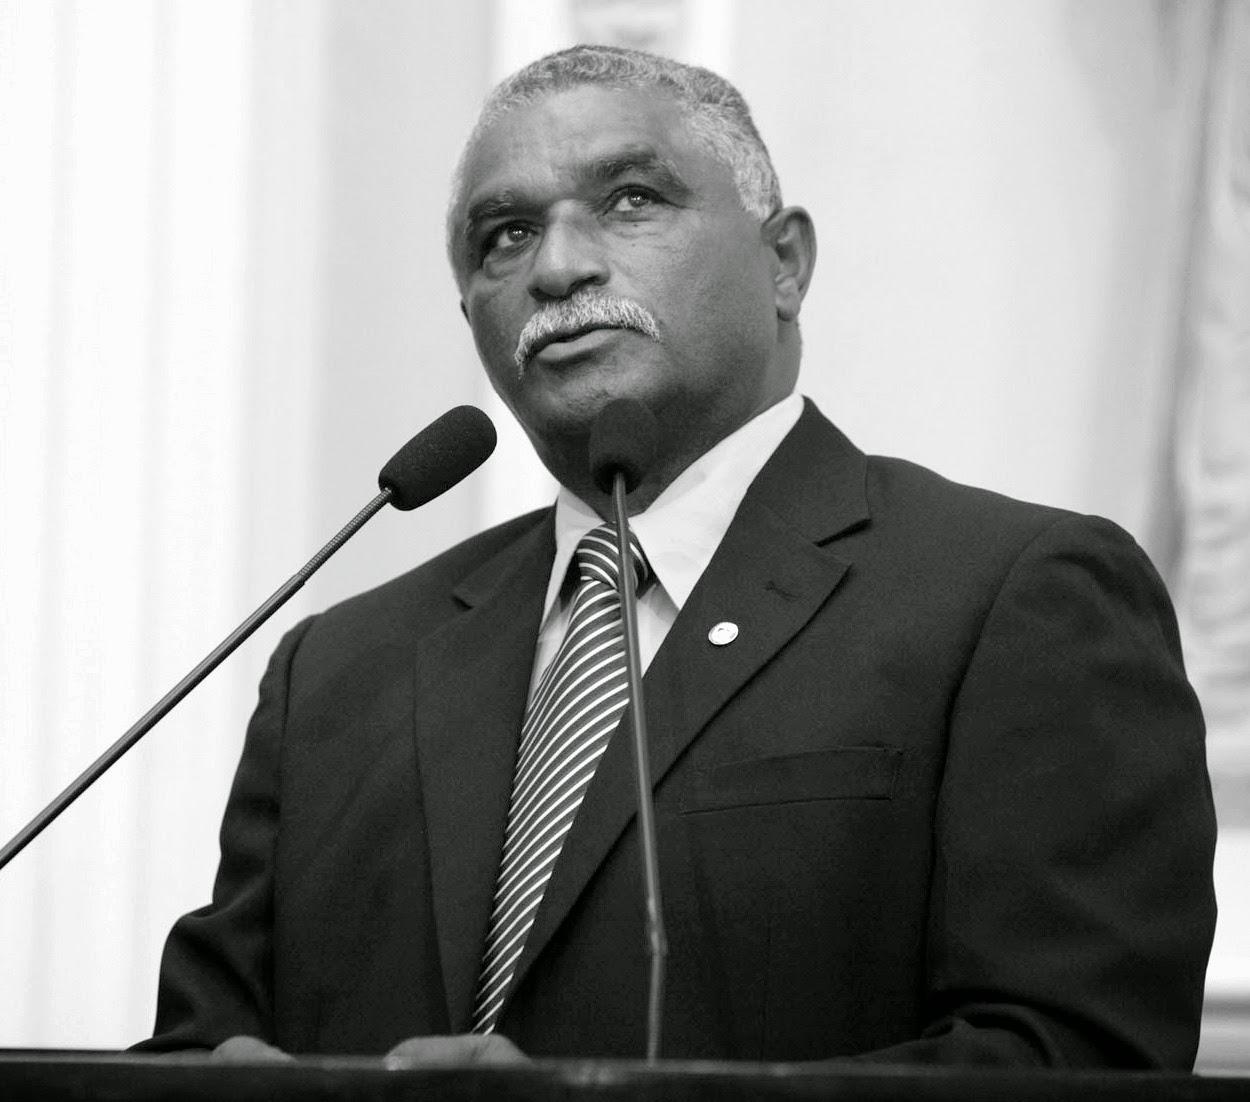 Morre Deputado Estadual